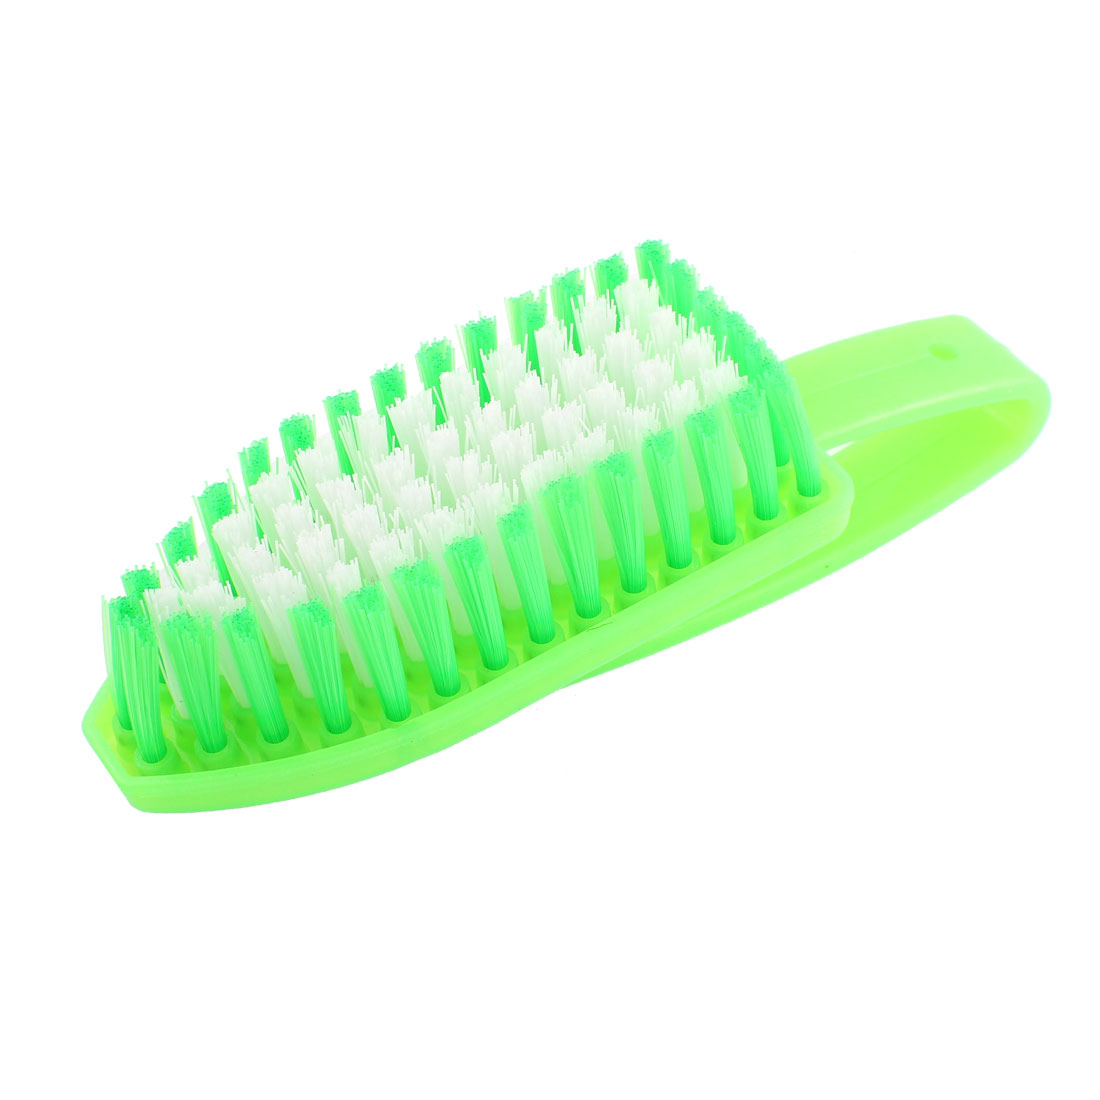 Home Green Plastic Handgrip Clothing Floor Washing Scrubbing Brush